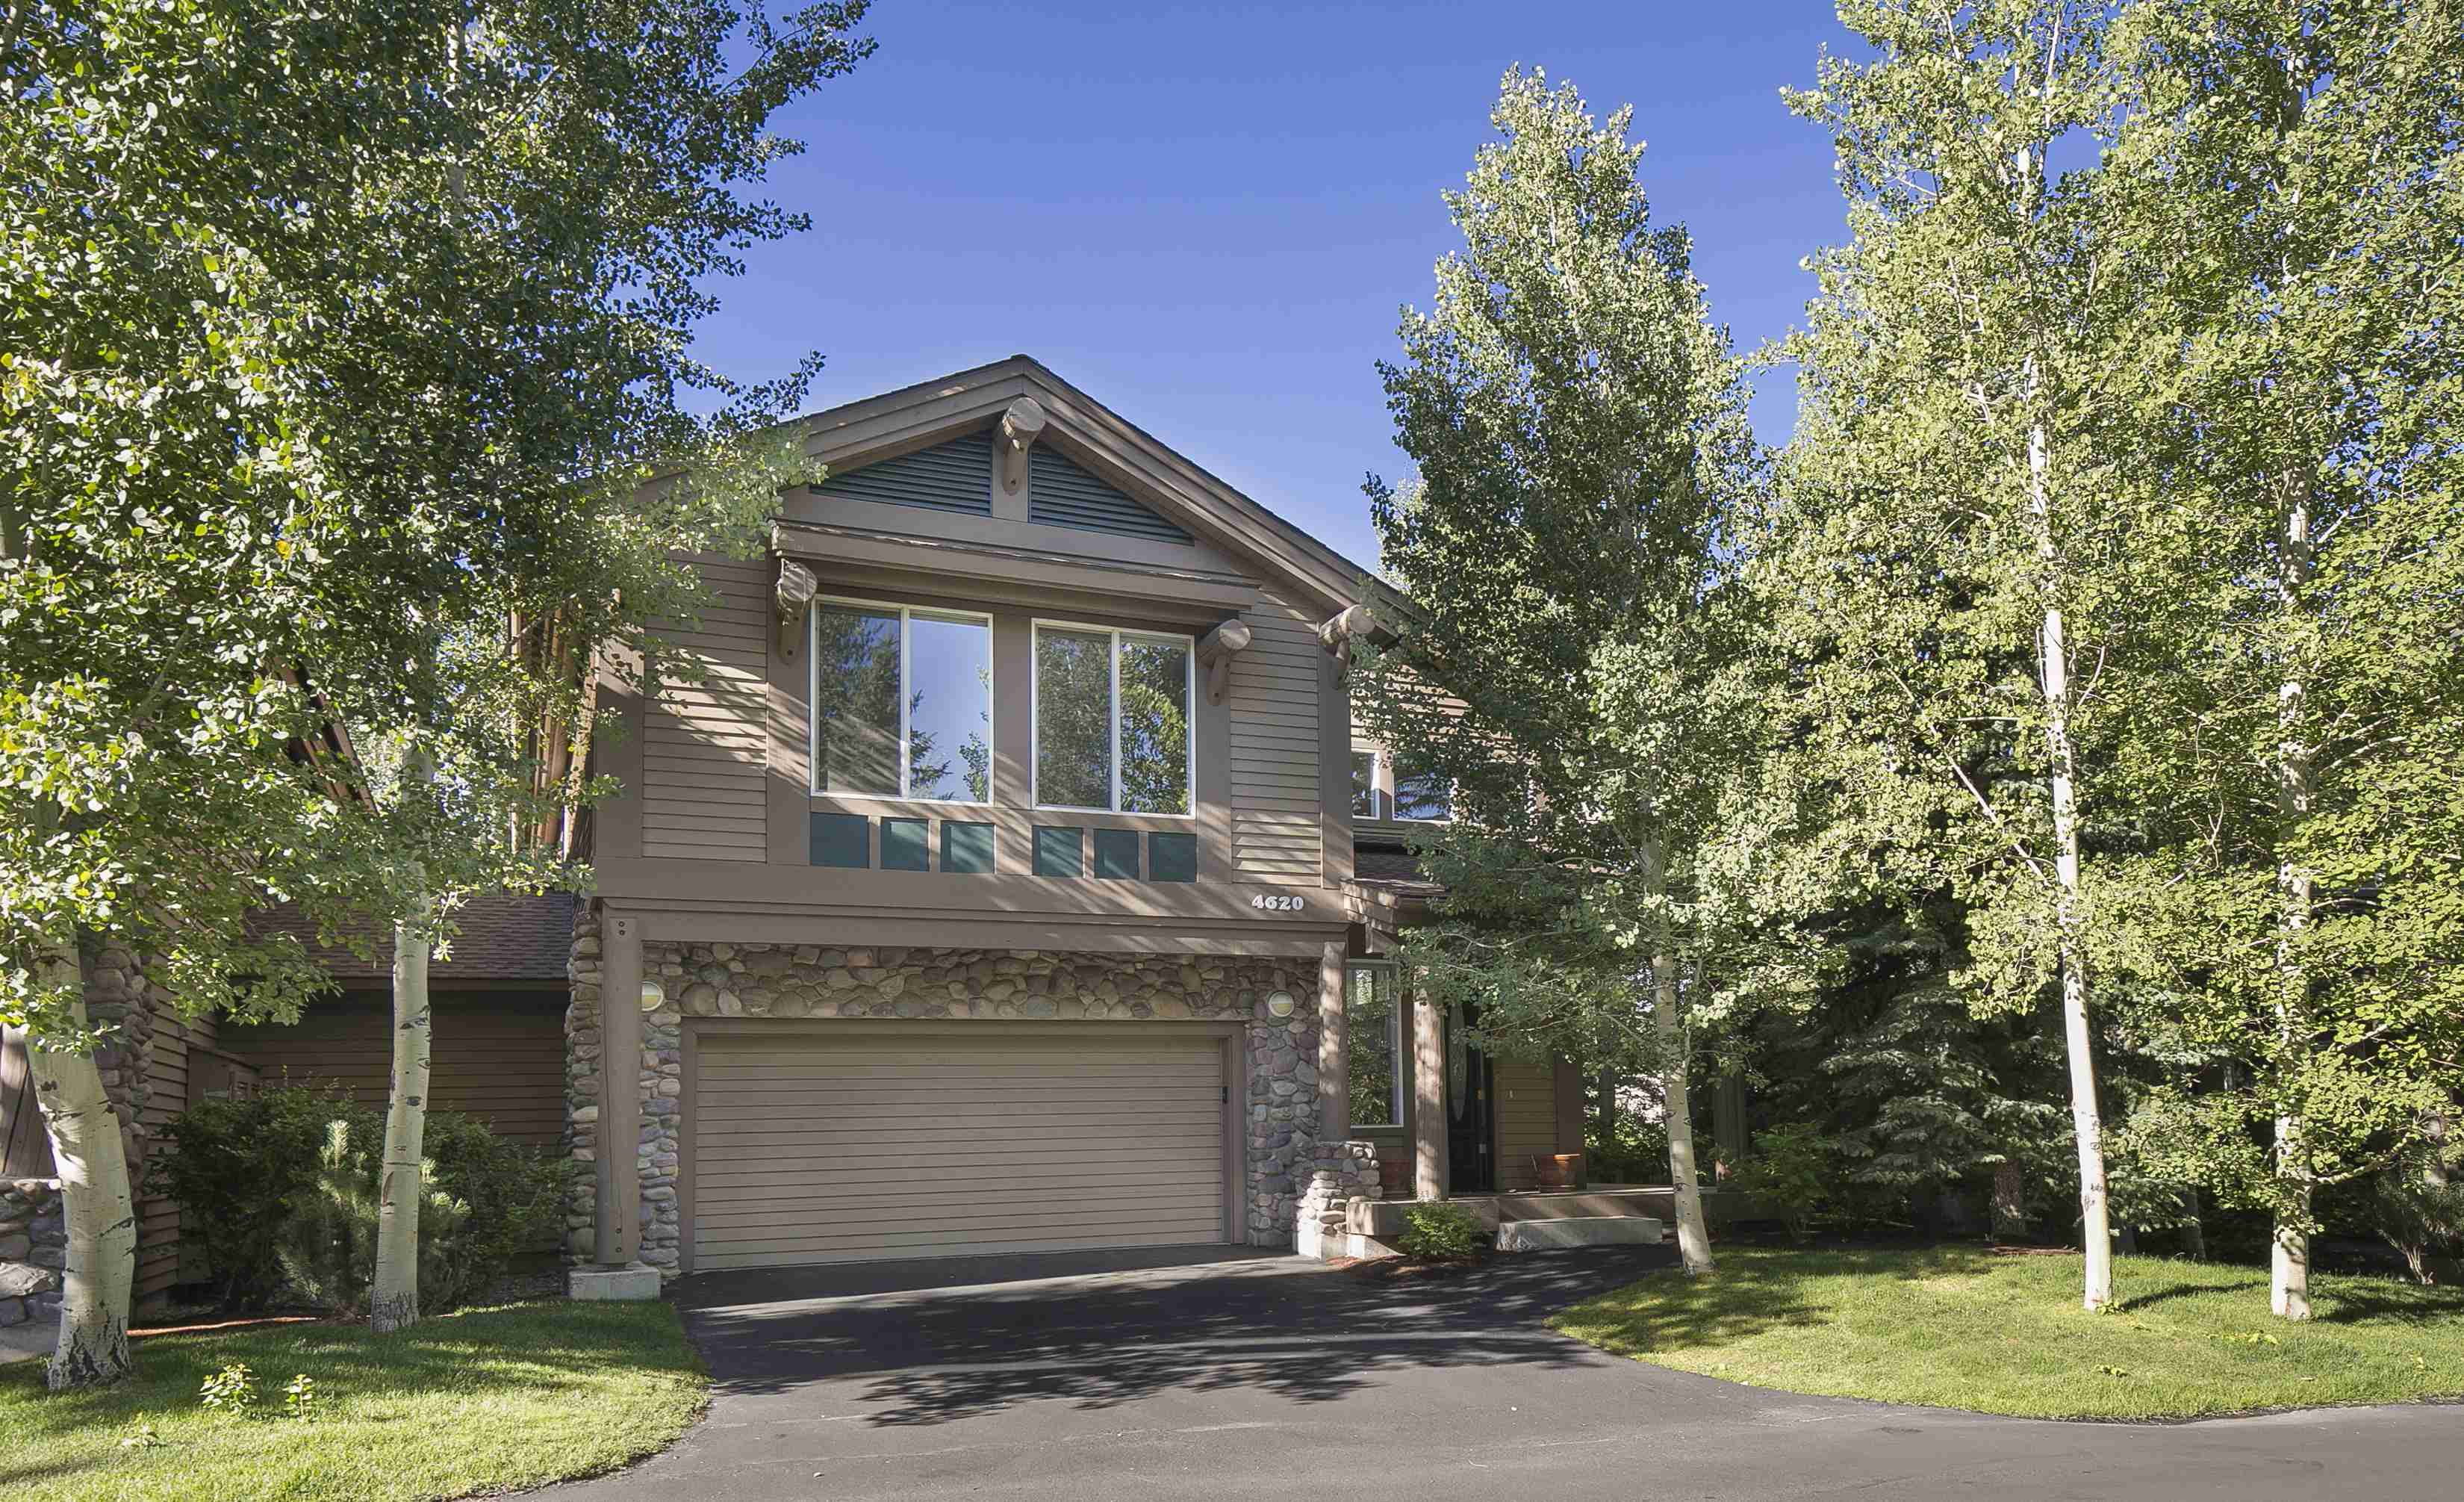 Condomínio para Venda às Bright and Spacious 4620 Arrowwood Condo Dr Elkhorn, Sun Valley, Idaho 83353 Estados Unidos